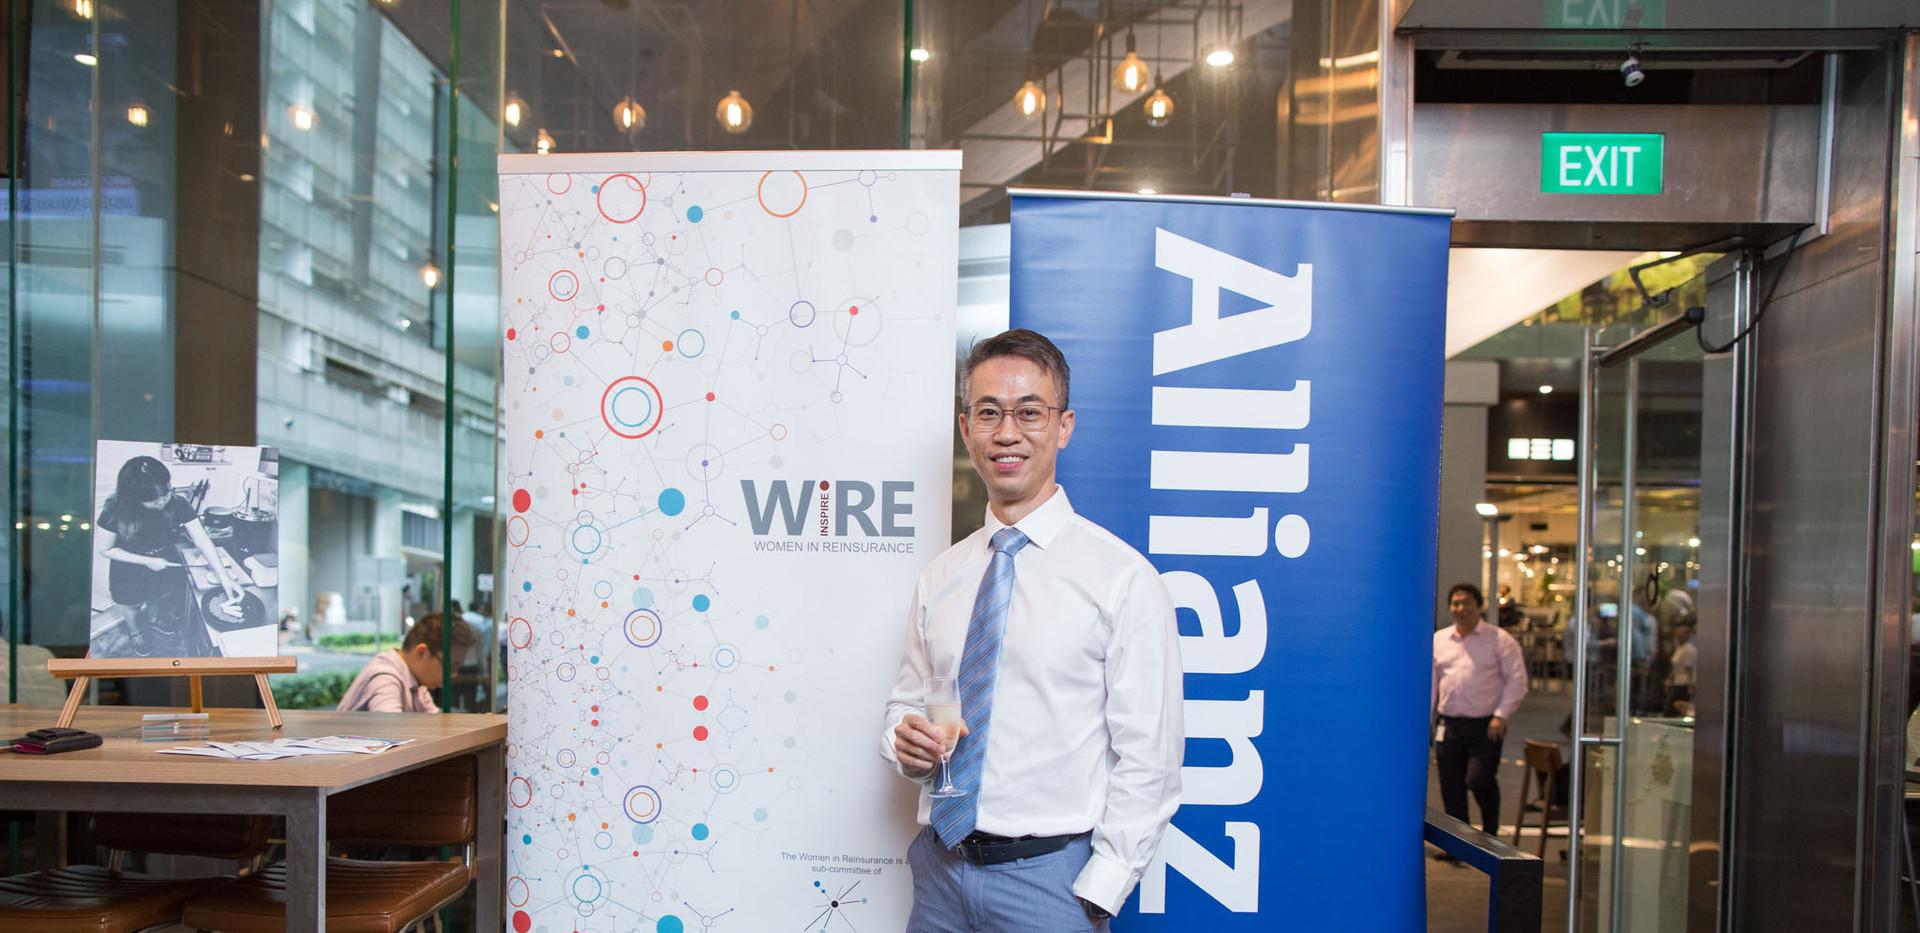 (11th Dec) WIRE & ALLIANZ - ART, Network